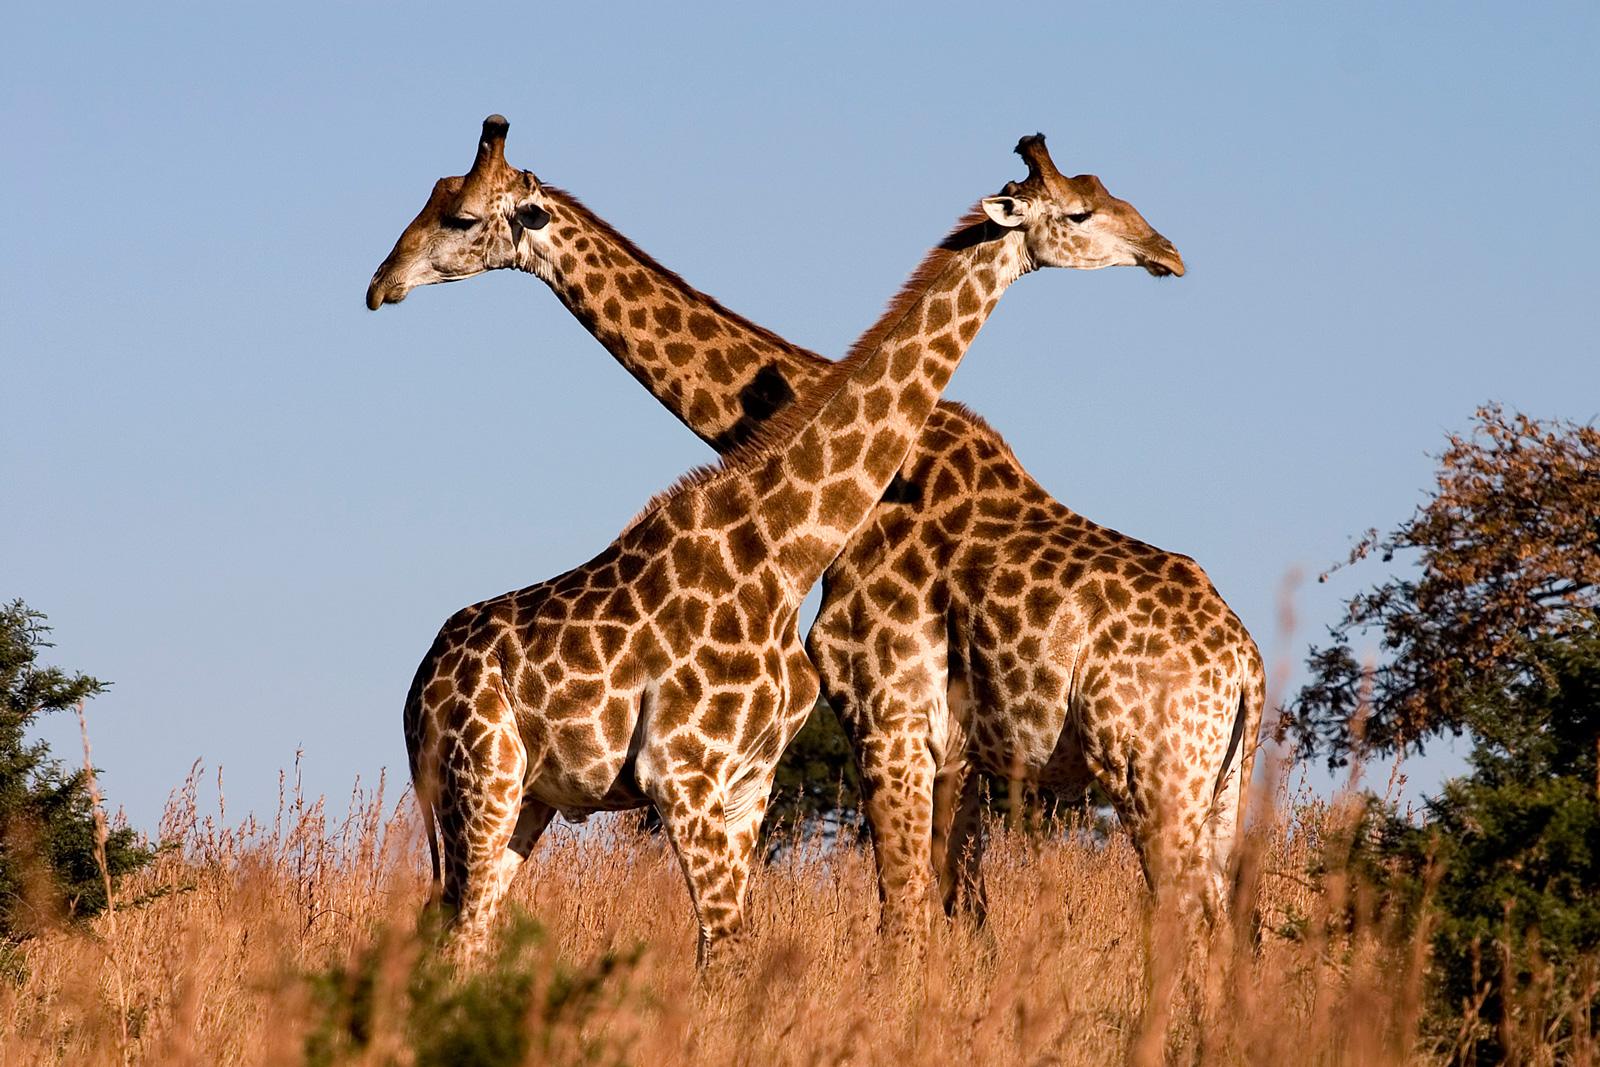 Giraffes. Photo credit: Luca Galuzzi. https://commons.wikimedia.org/wiki/File:Giraffe_Ithala_KZN_South_Africa_Luca_Galuzzi_2004.JPG